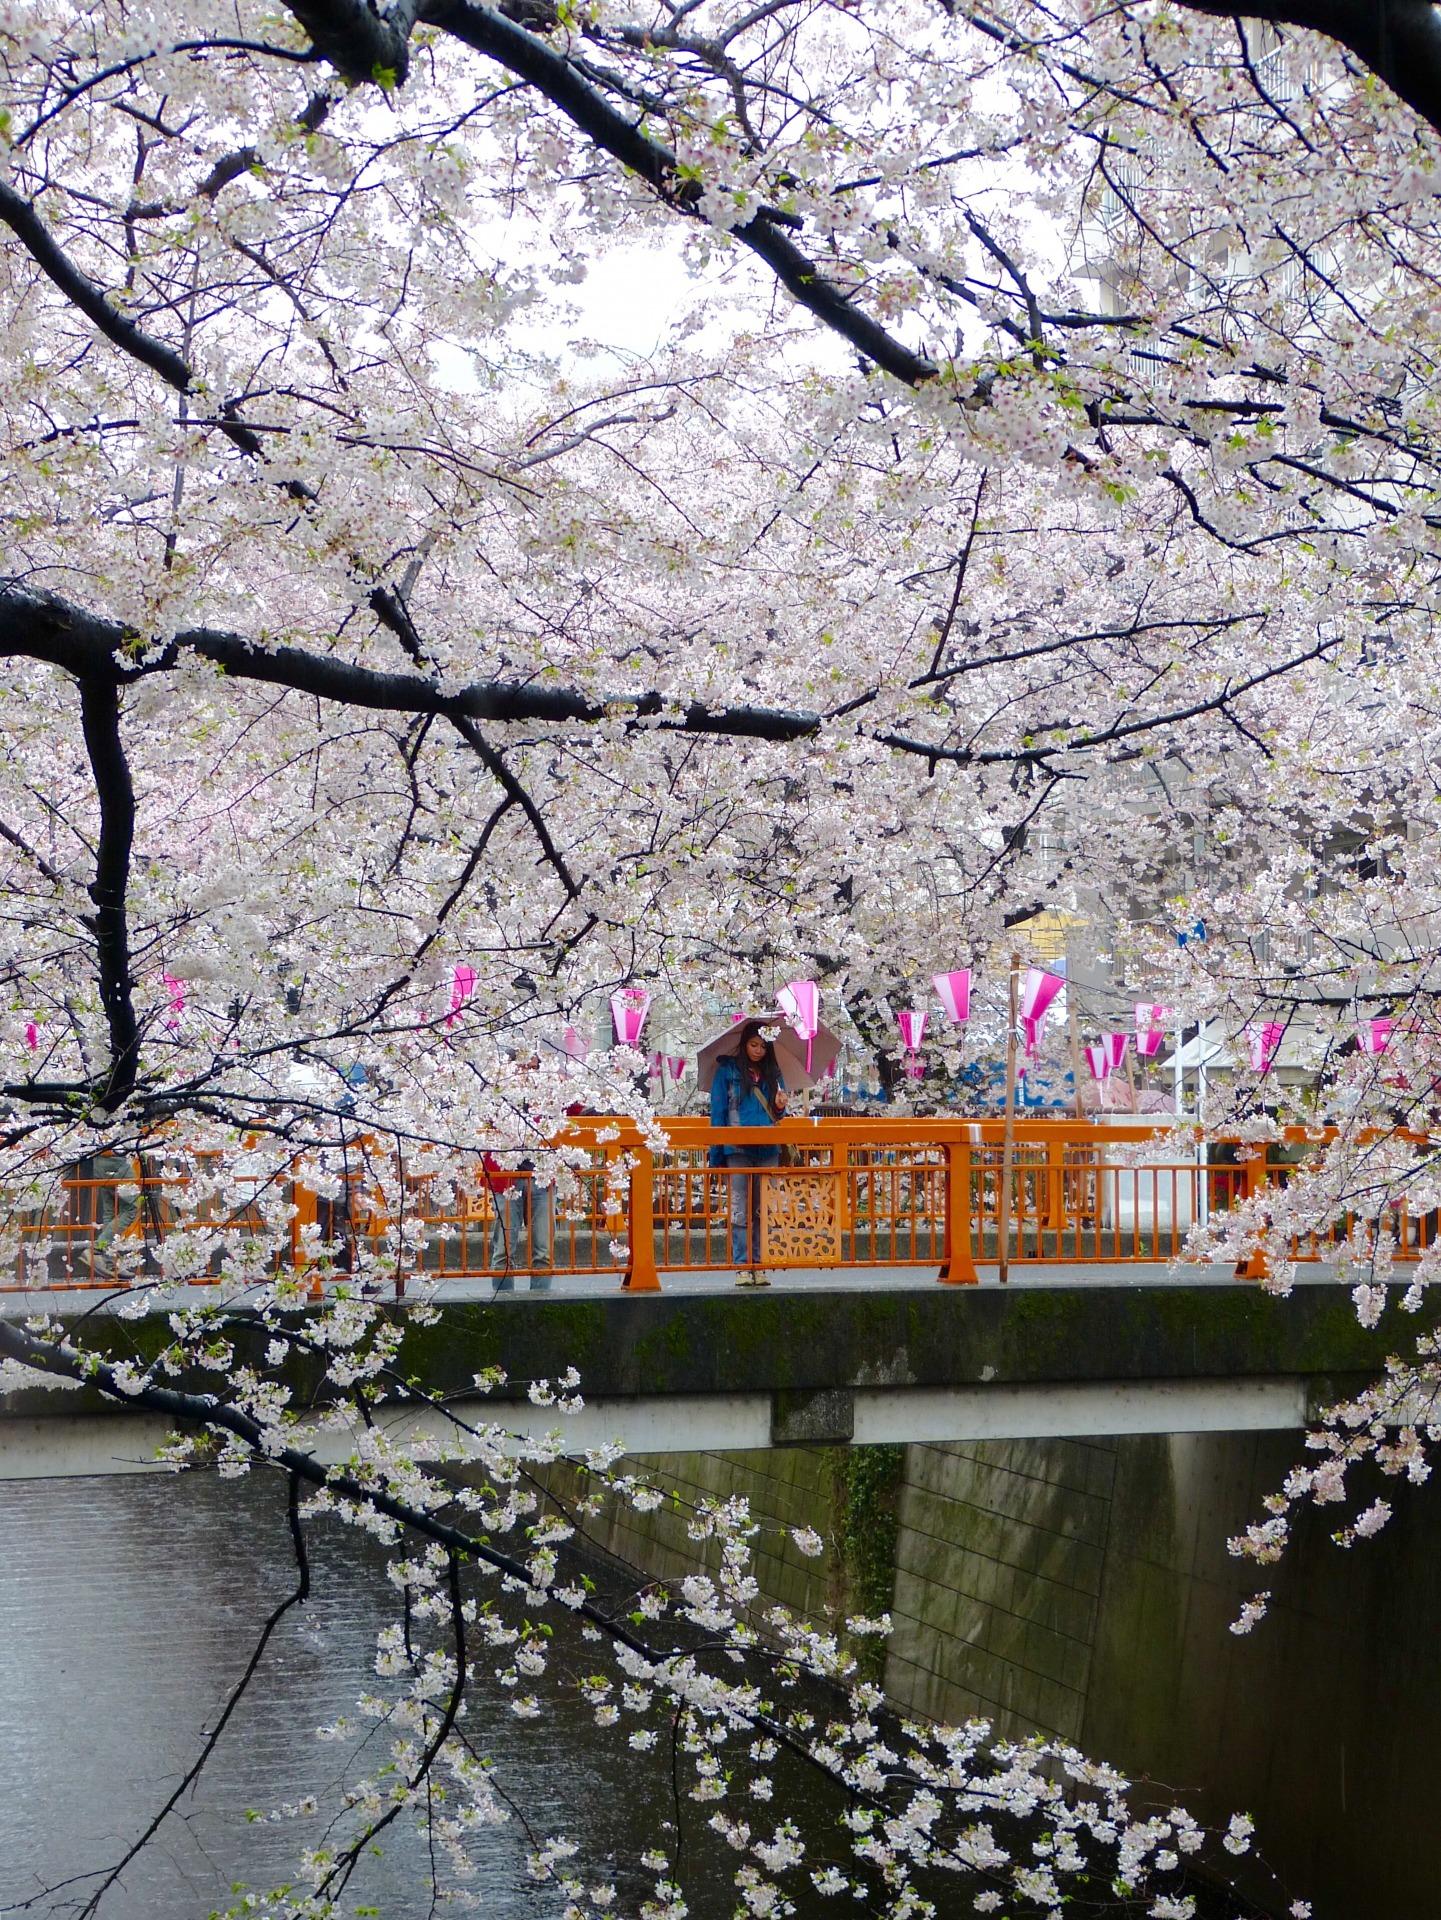 Cherry blossom Meguro river Japan Familyearthtrek